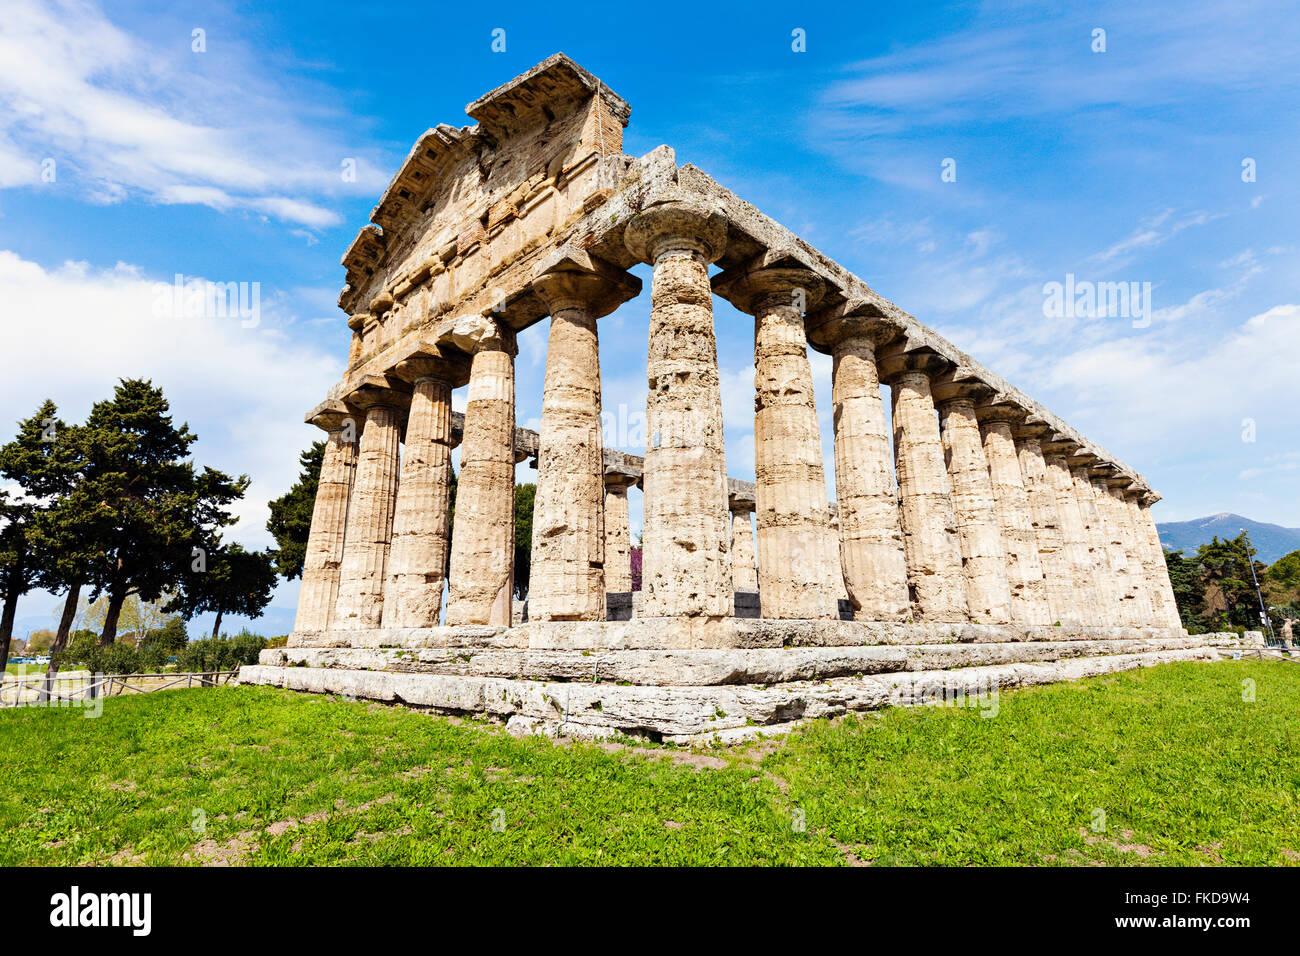 Columnas arquitectónicas antiguas ruinas de Paestum, sobre el césped Imagen De Stock